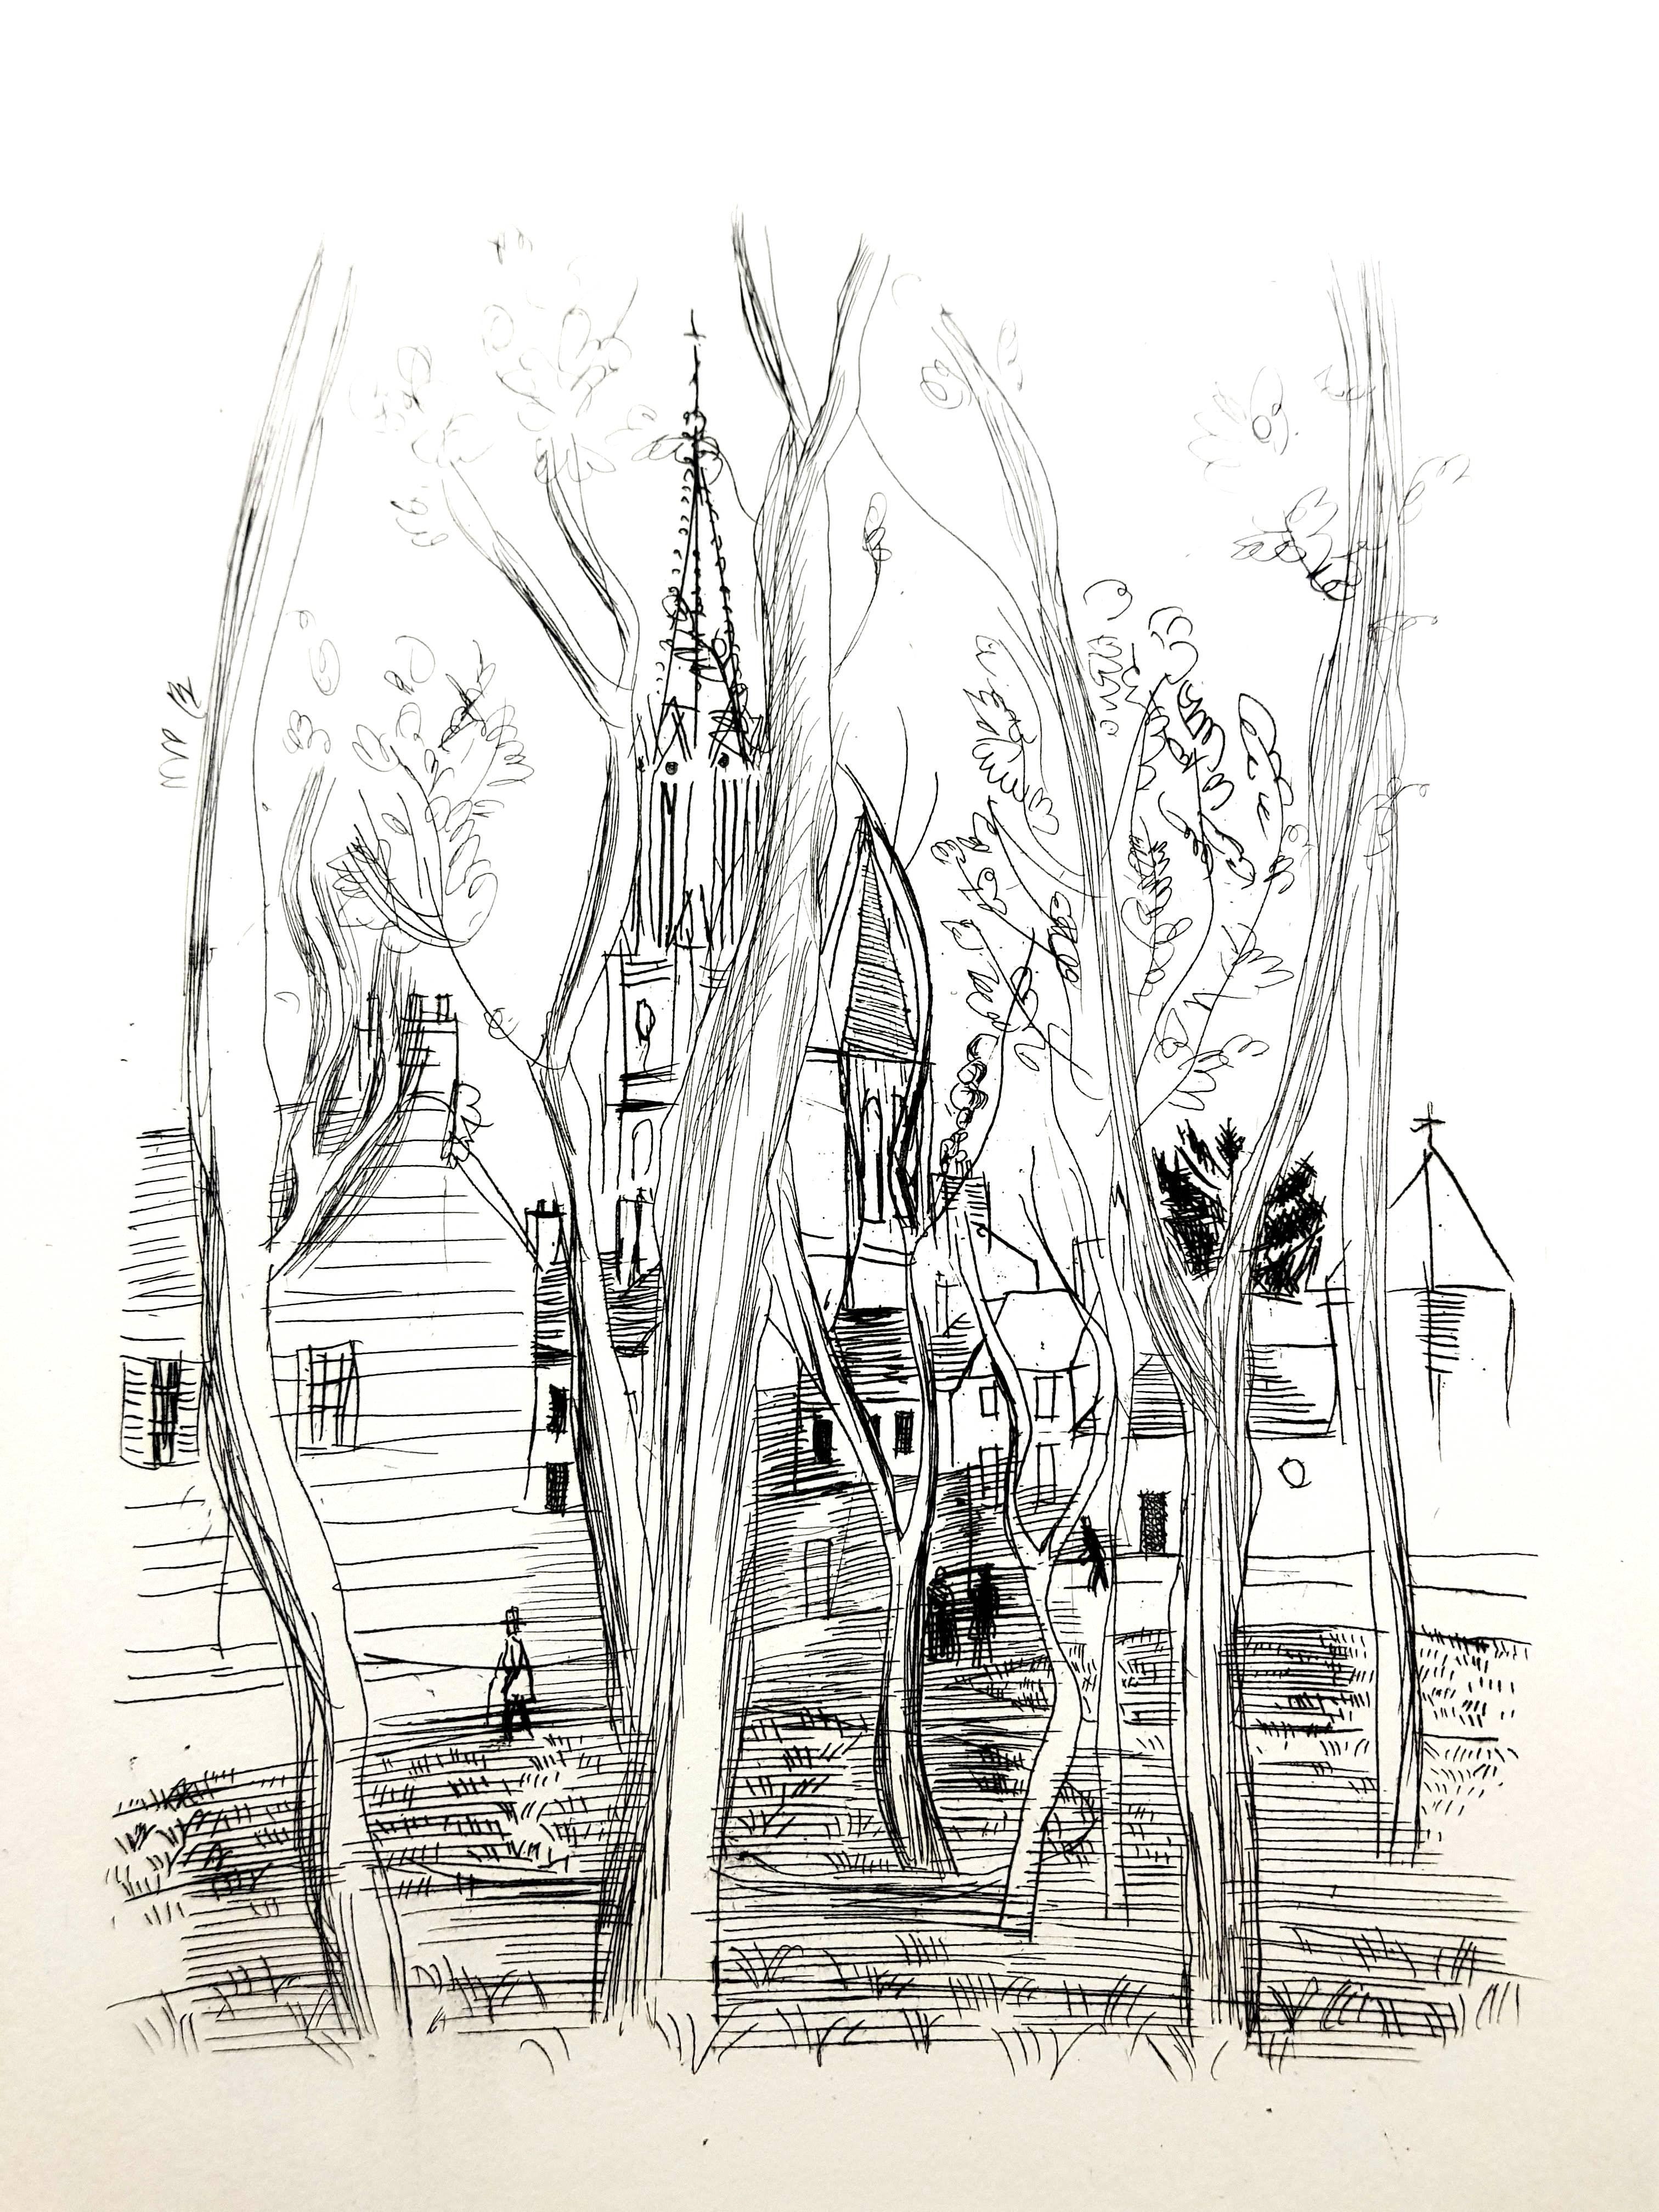 Raoul Dufy - Village - Original Etching